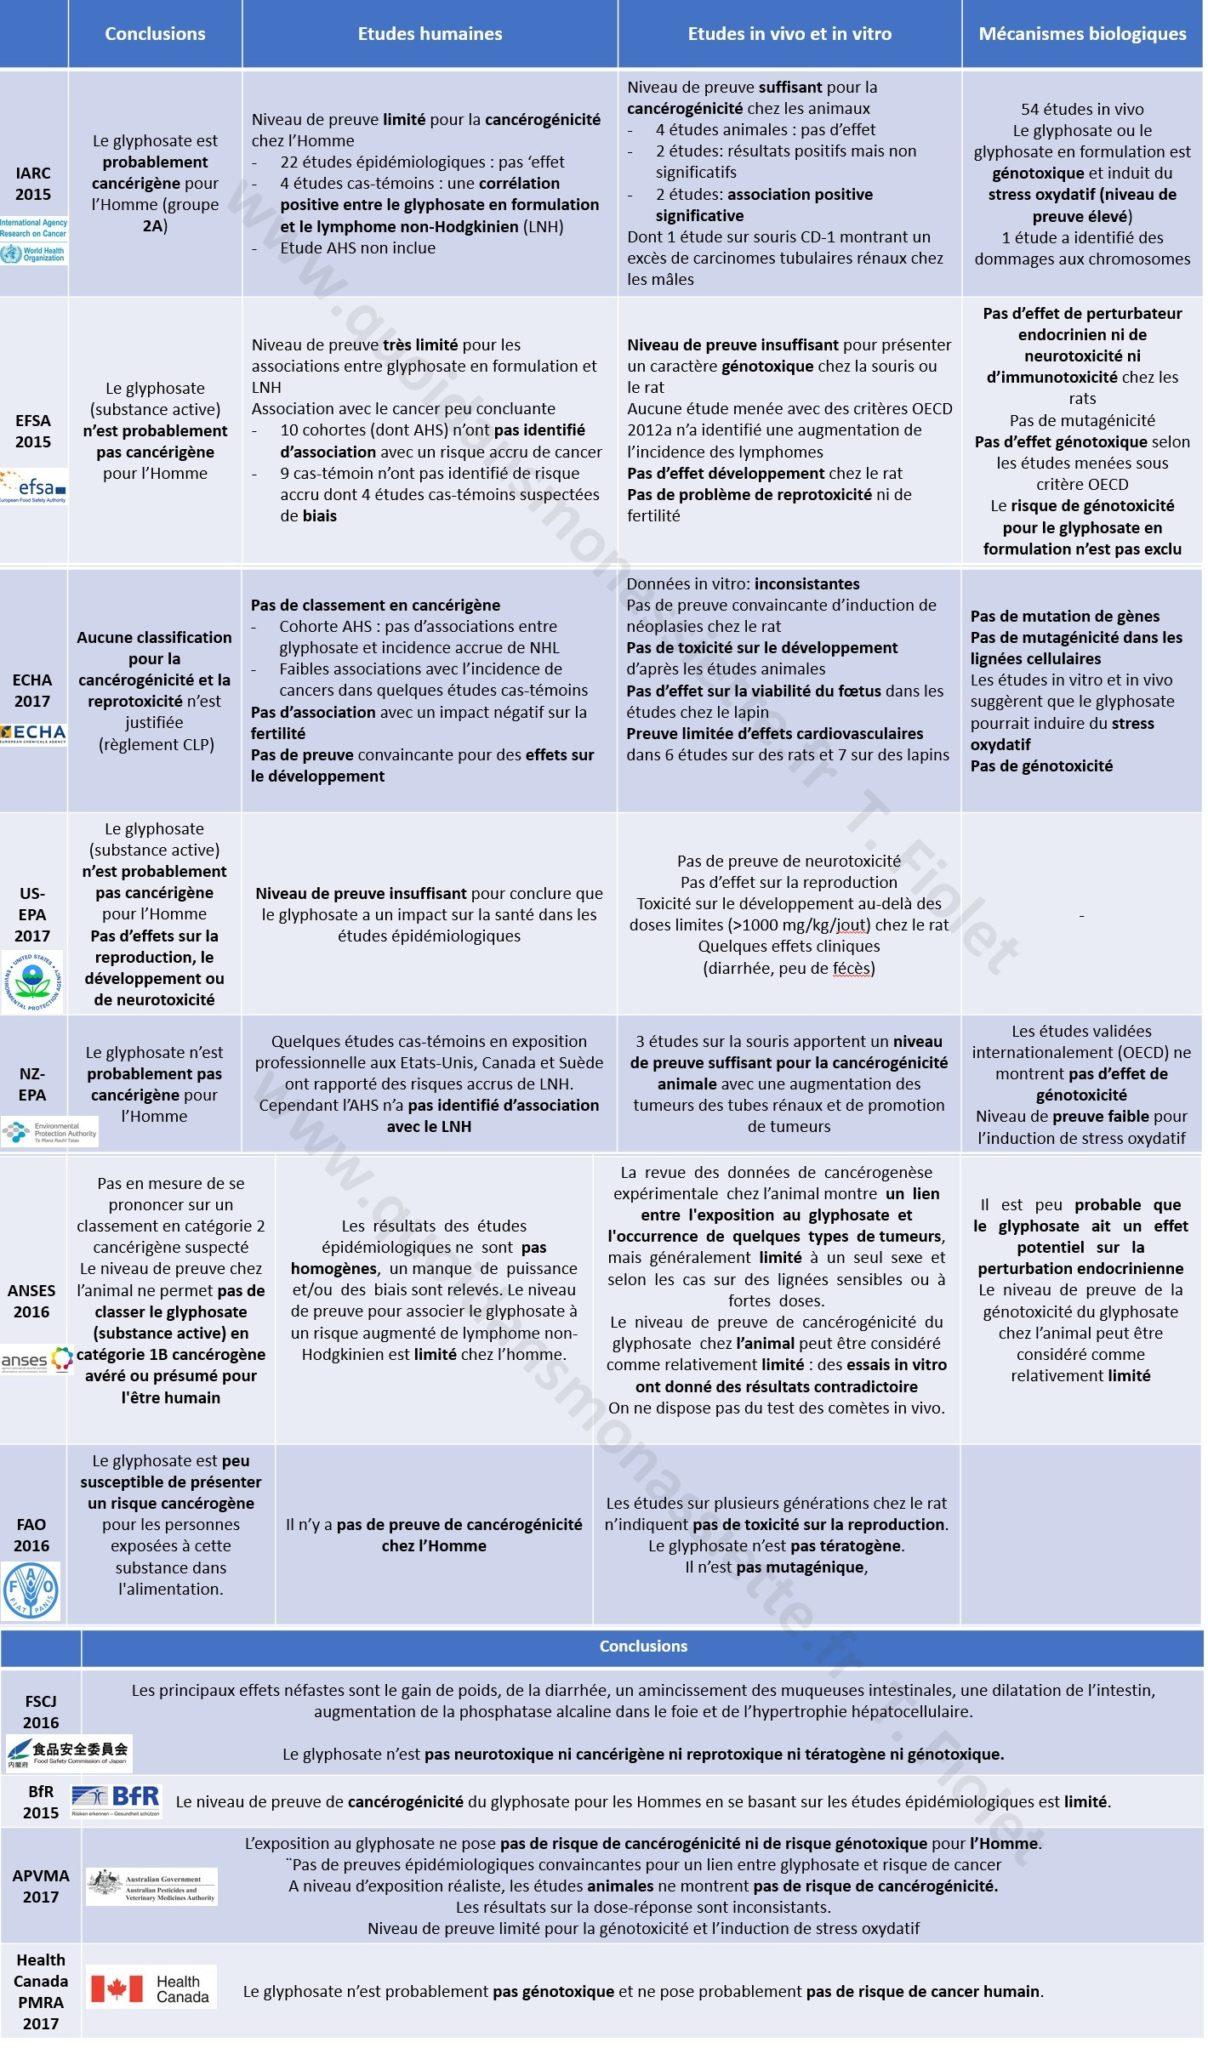 Glyphosate agences scientifiques européennes avis opinion scientific filigrane